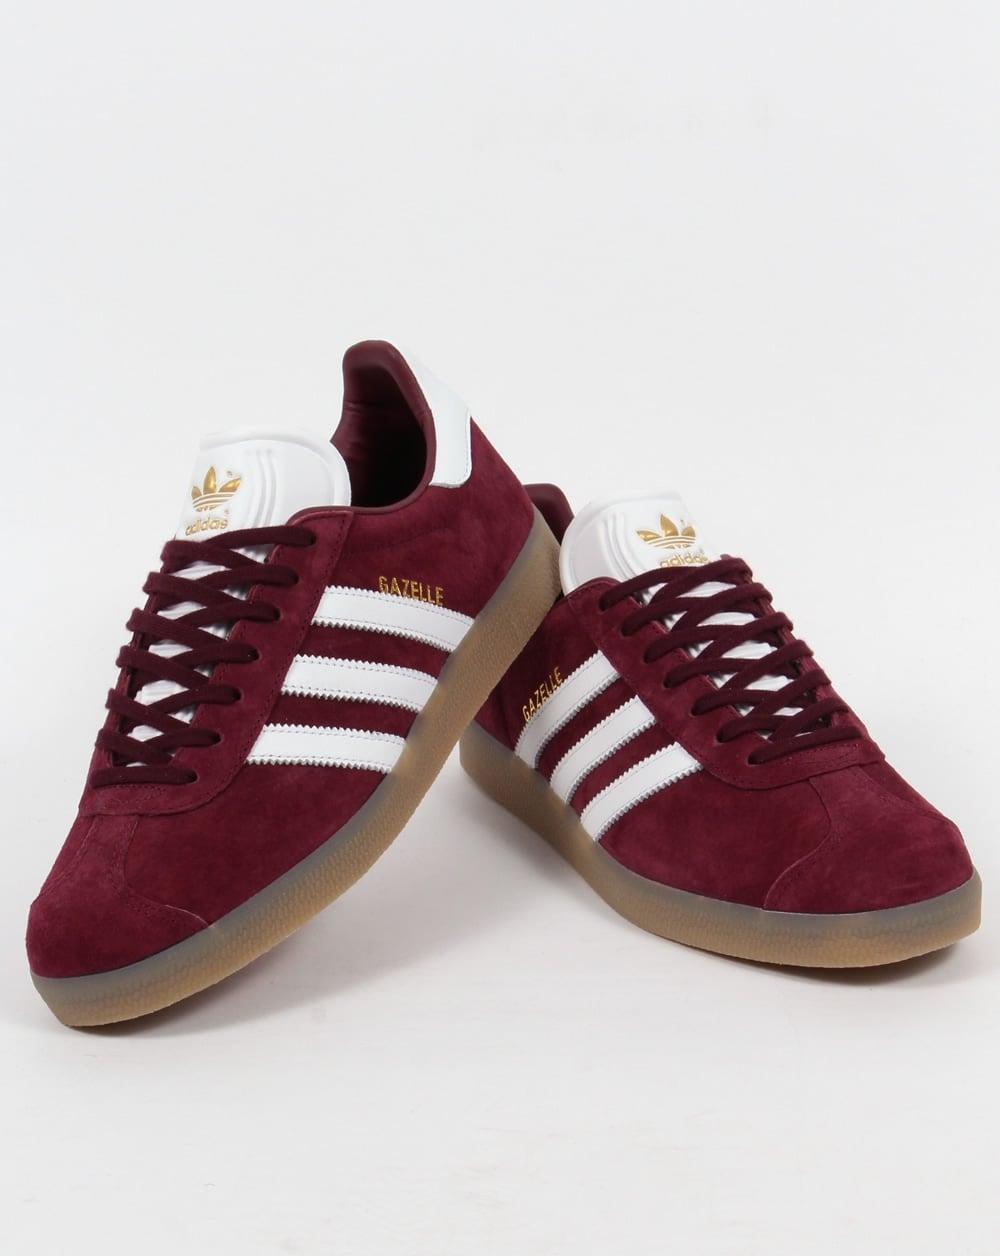 adidas gazelle marroon uk 6.5